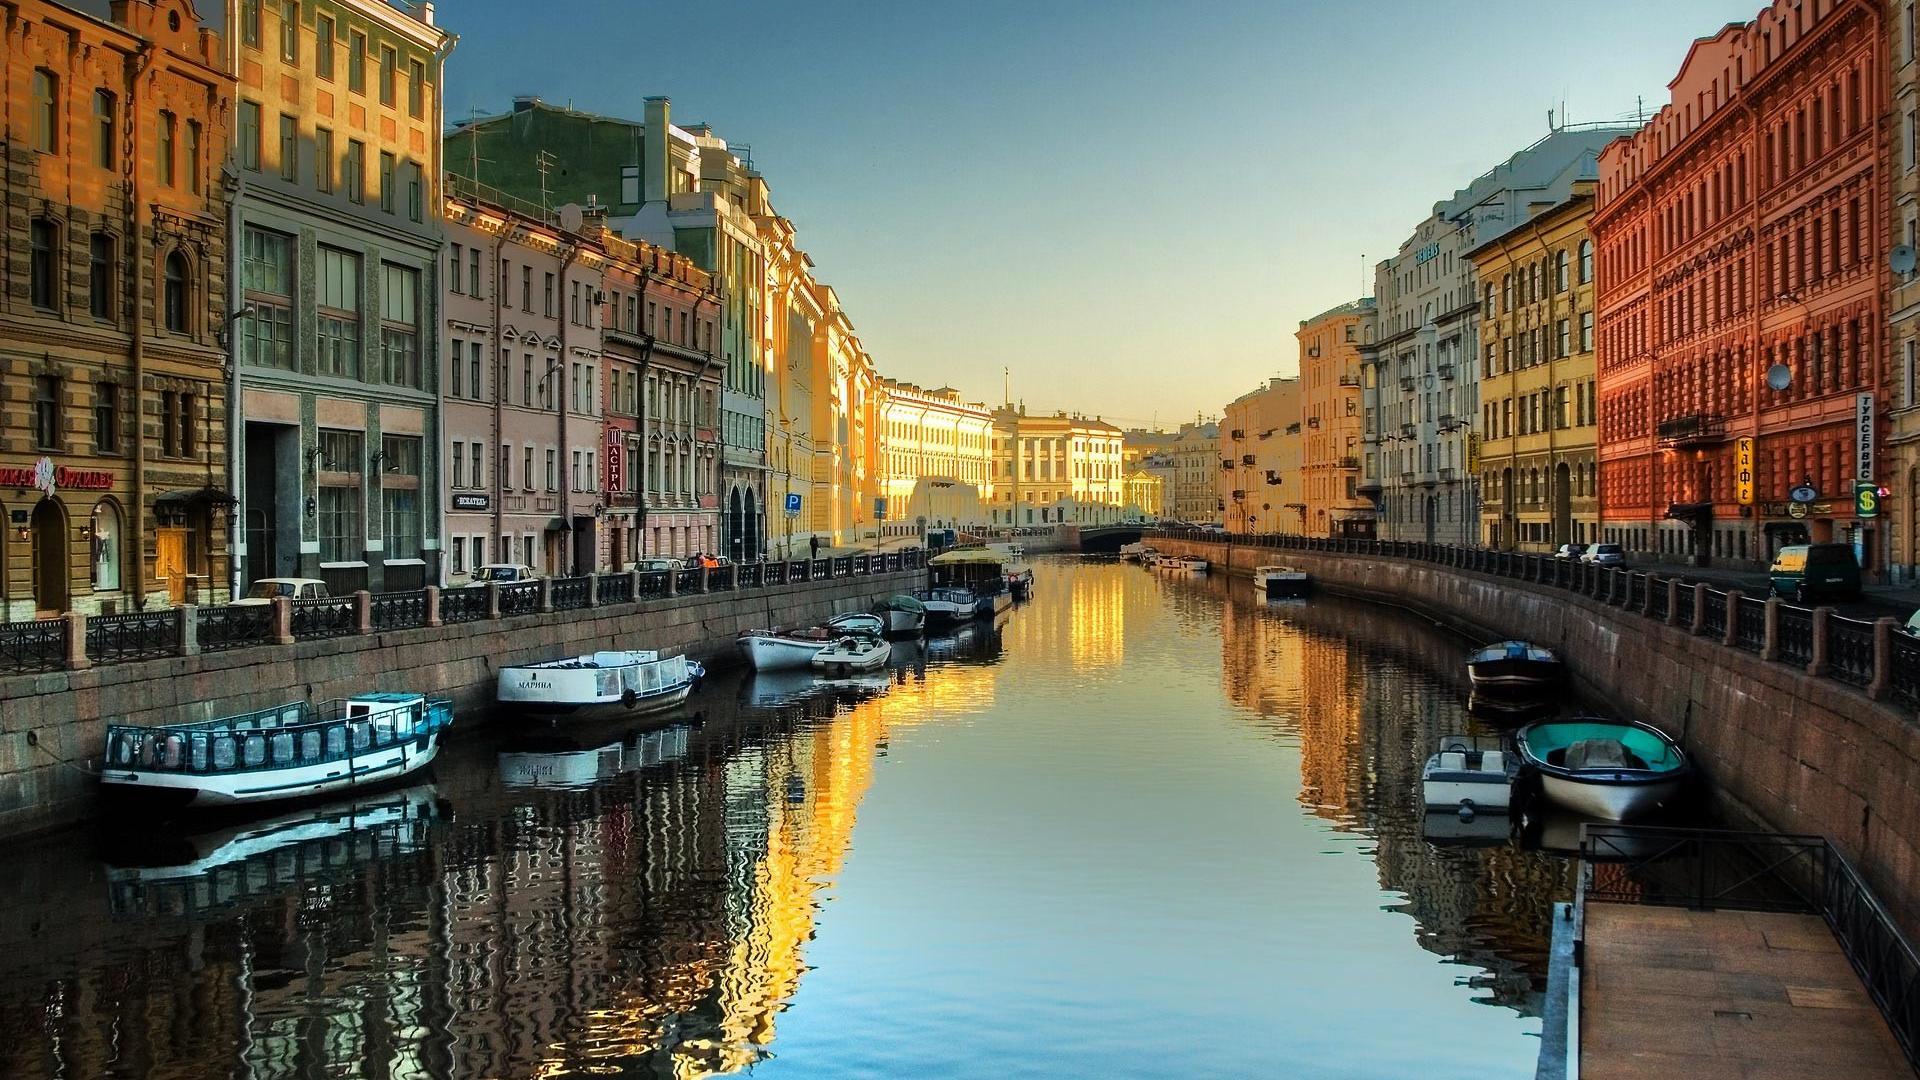 001 Saint Petersbourg - Russia